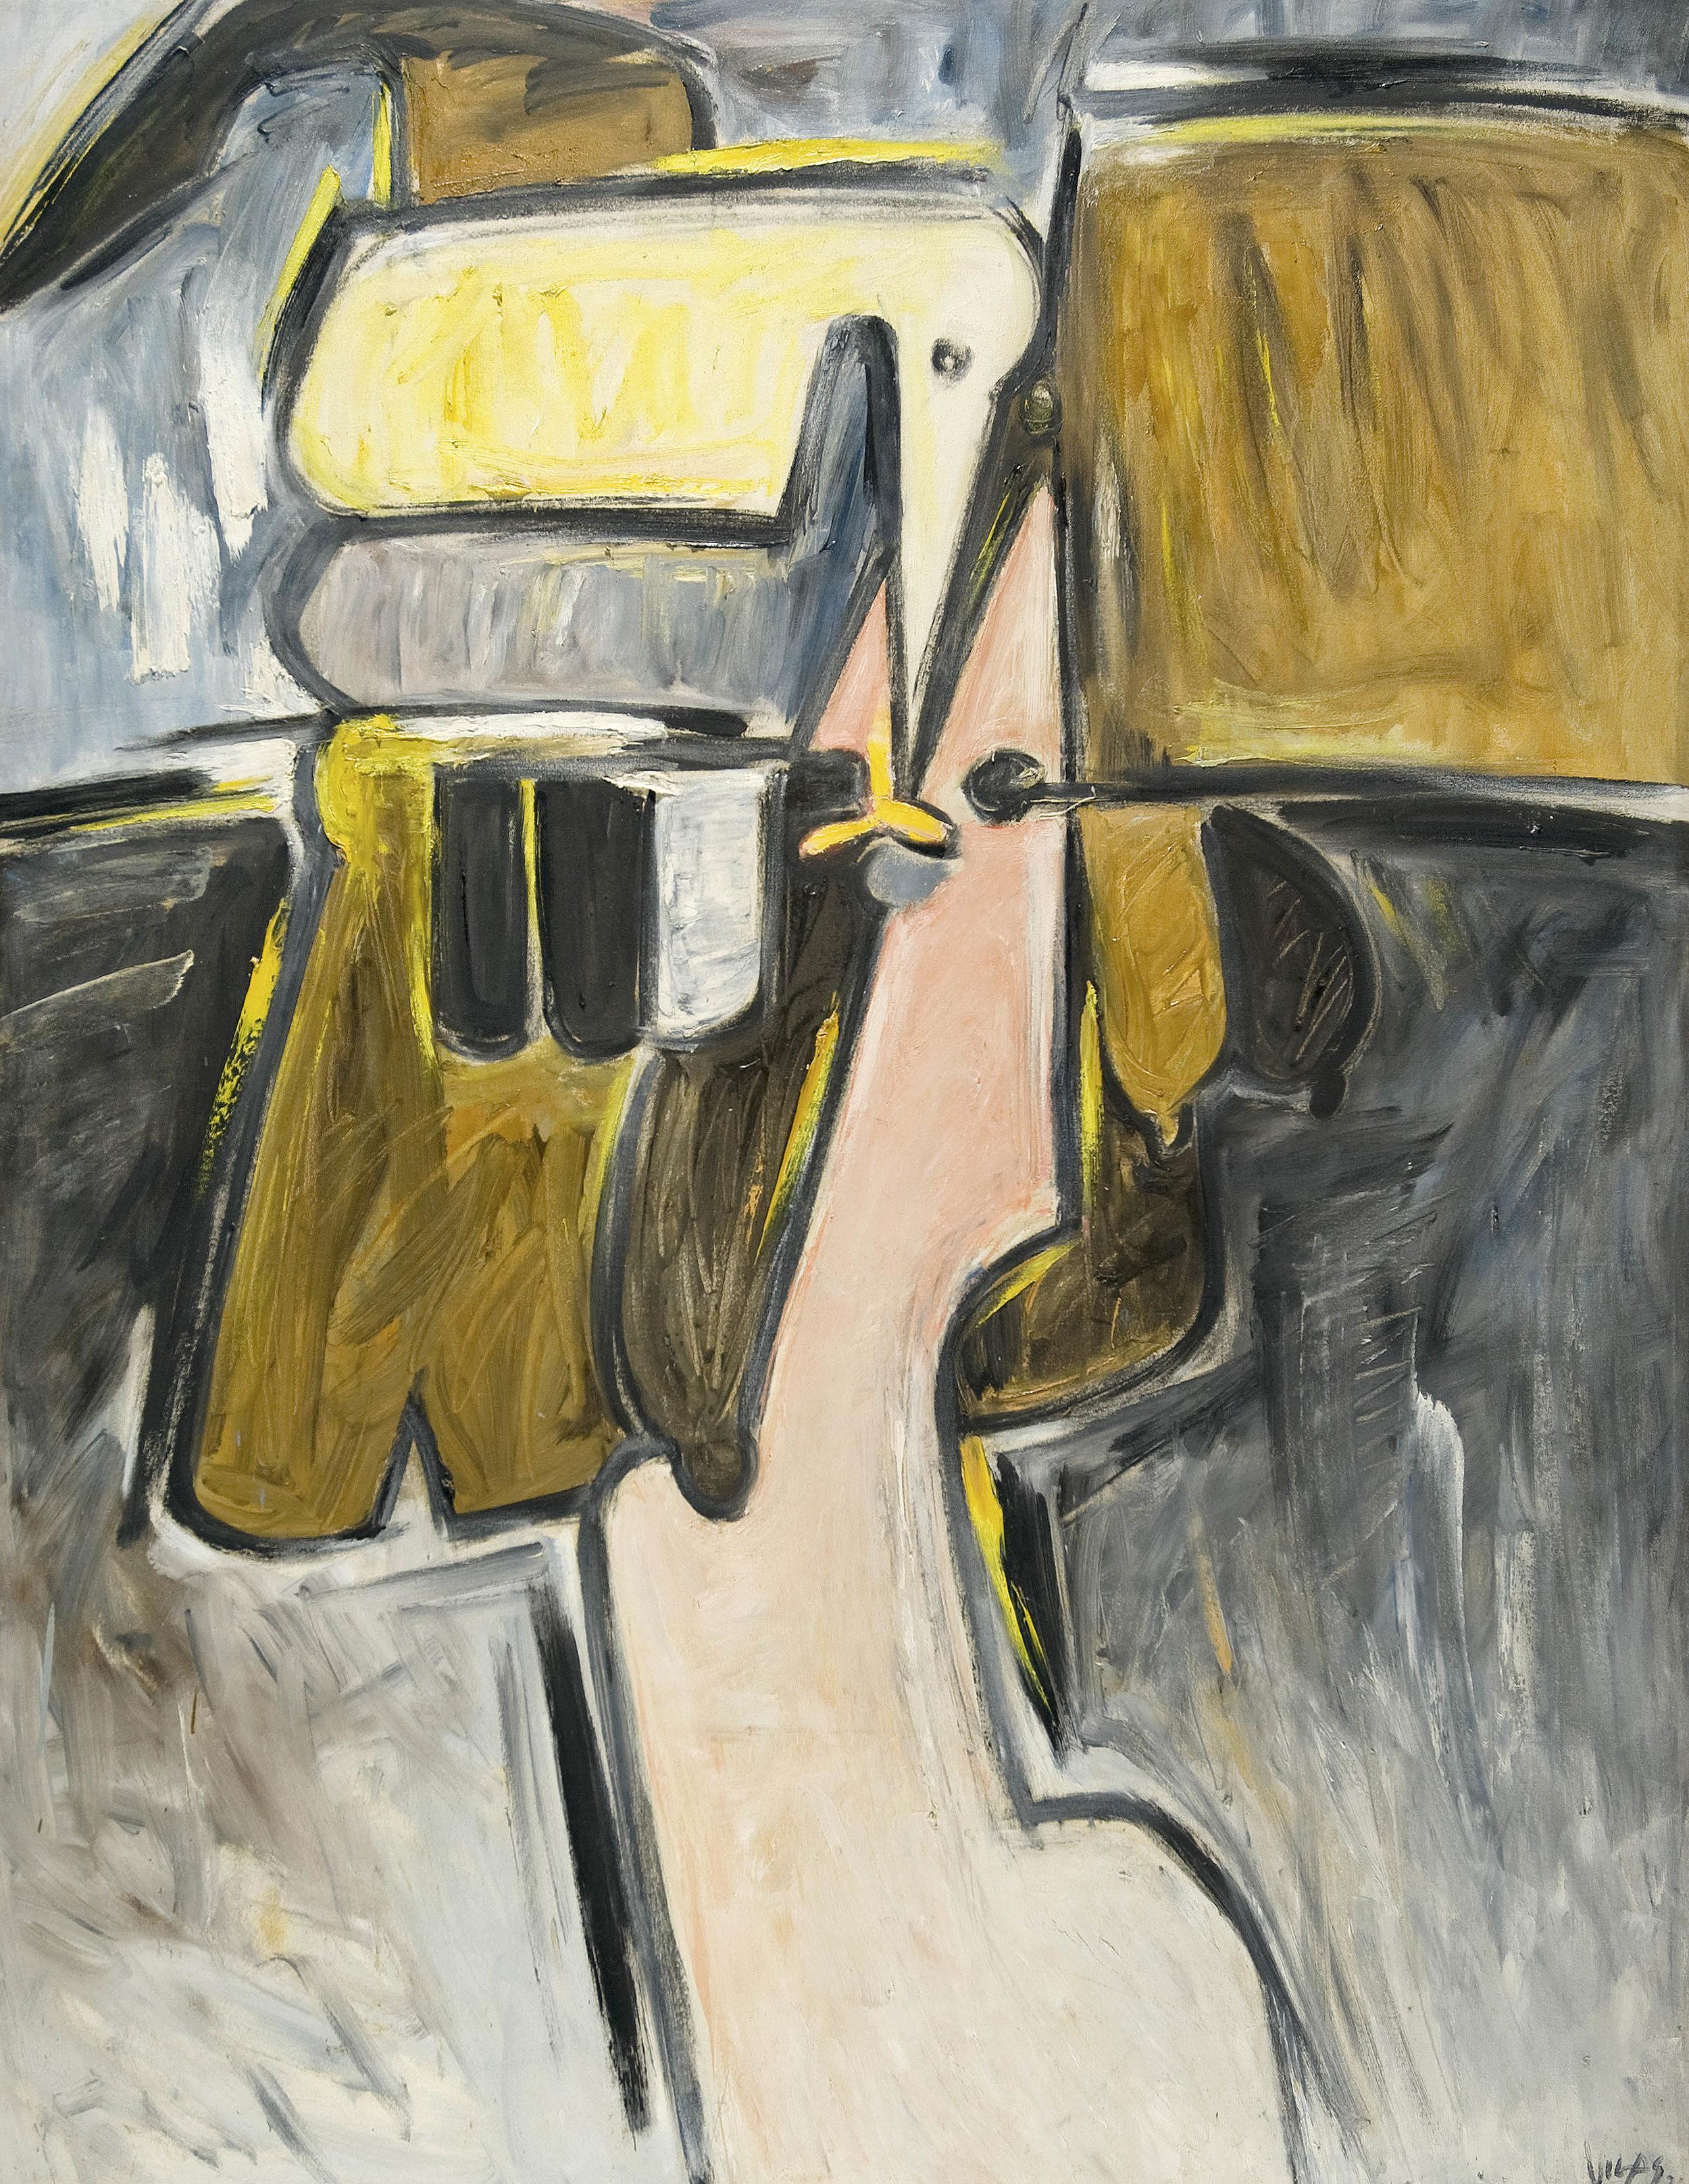 Oswaldo Vigas  Cabeza en Amarillo , 1976 Oil on Canvas 59 x 47 in.